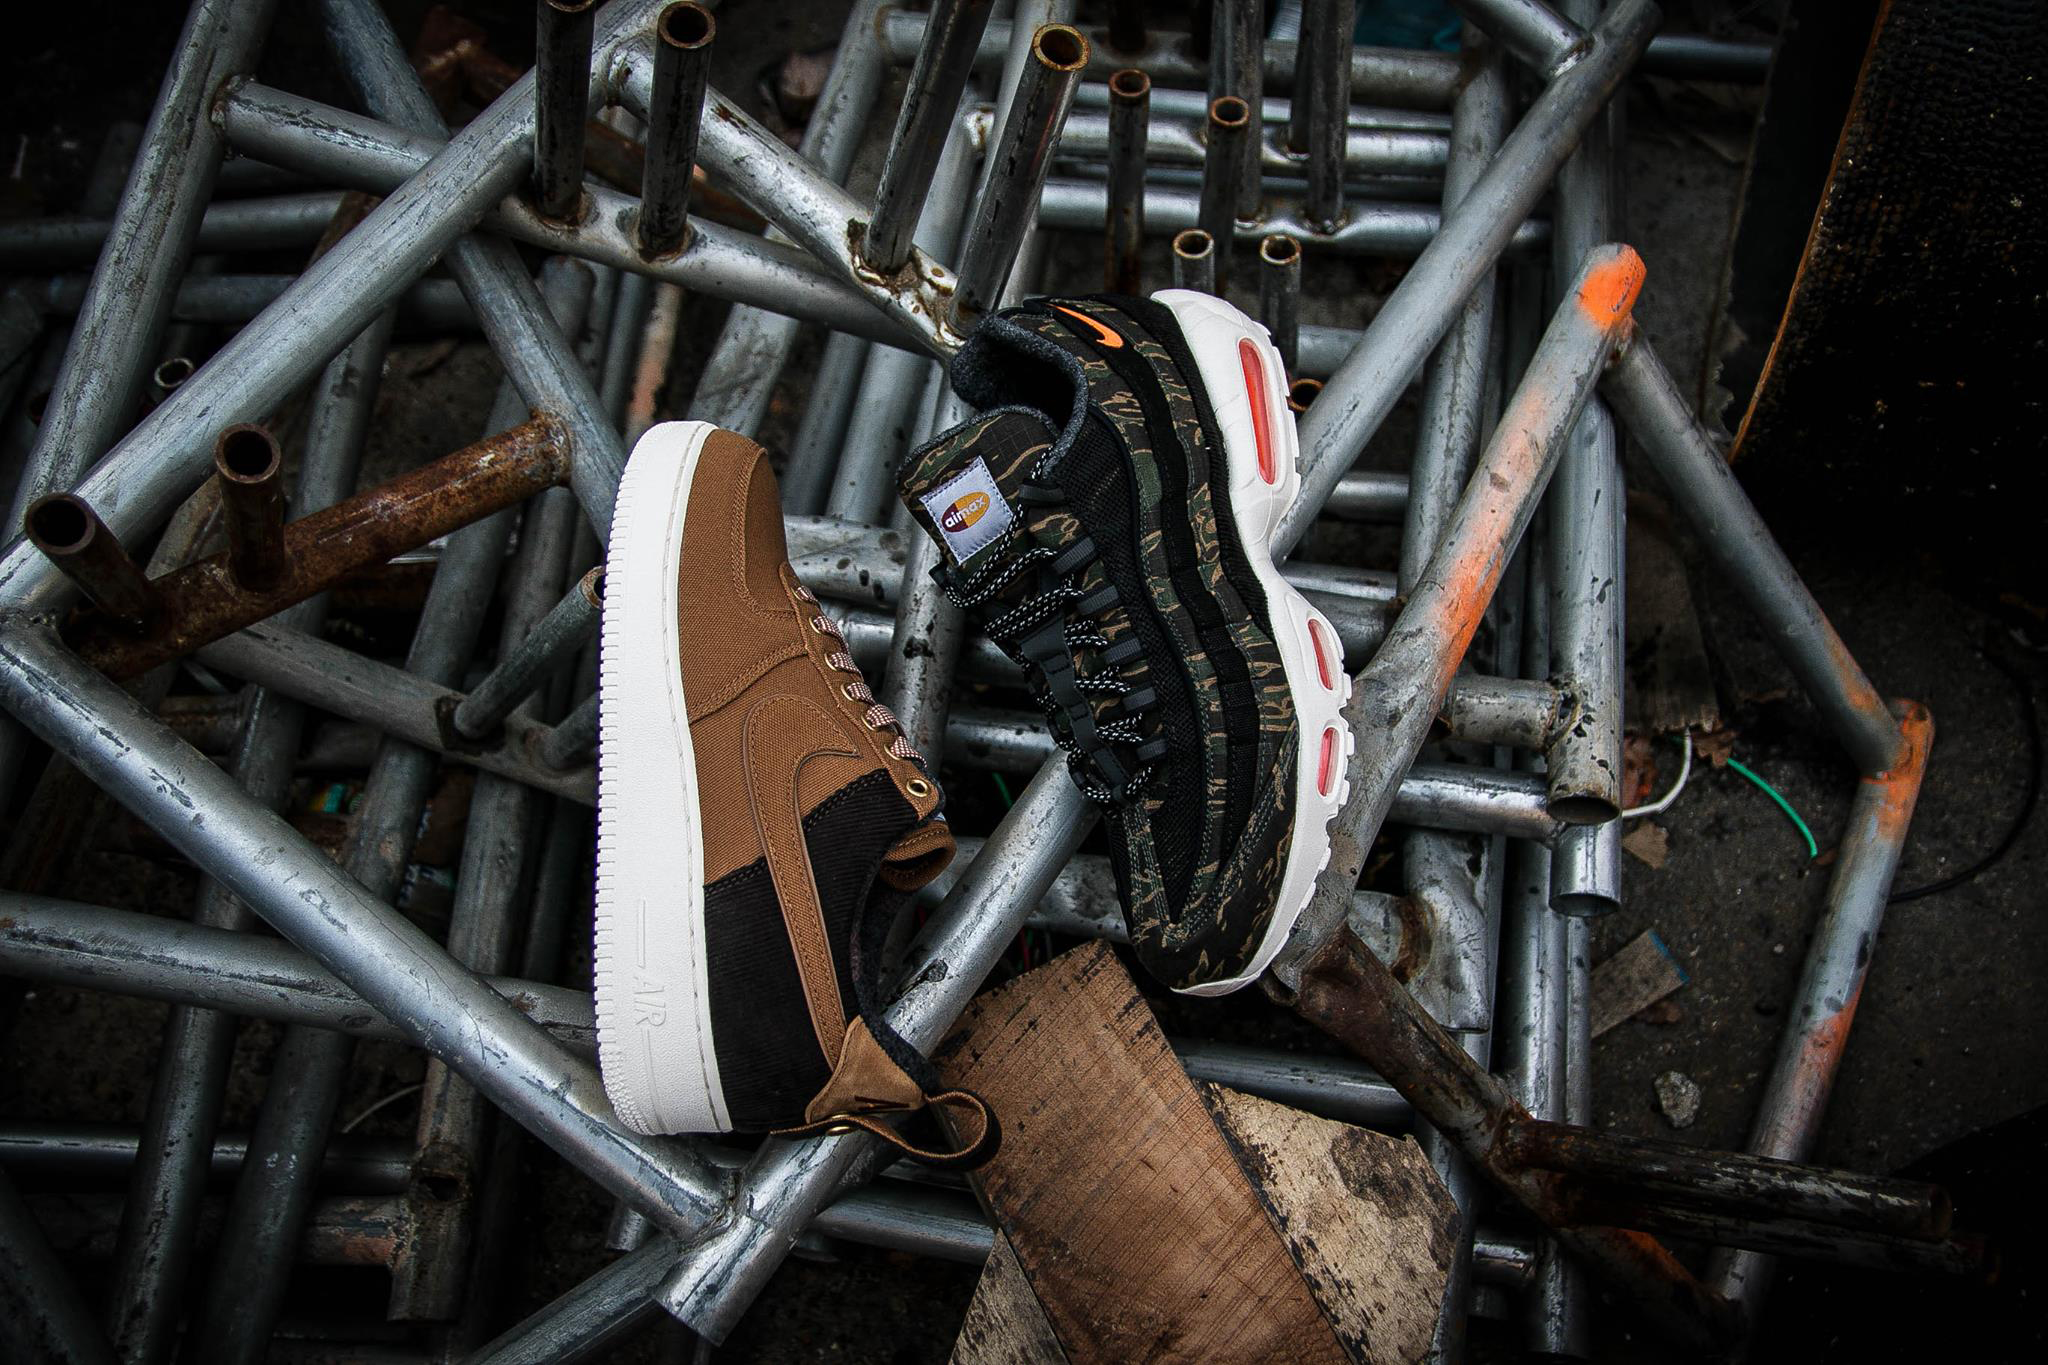 nike-x-carhartt-sneakers-where-to-buy